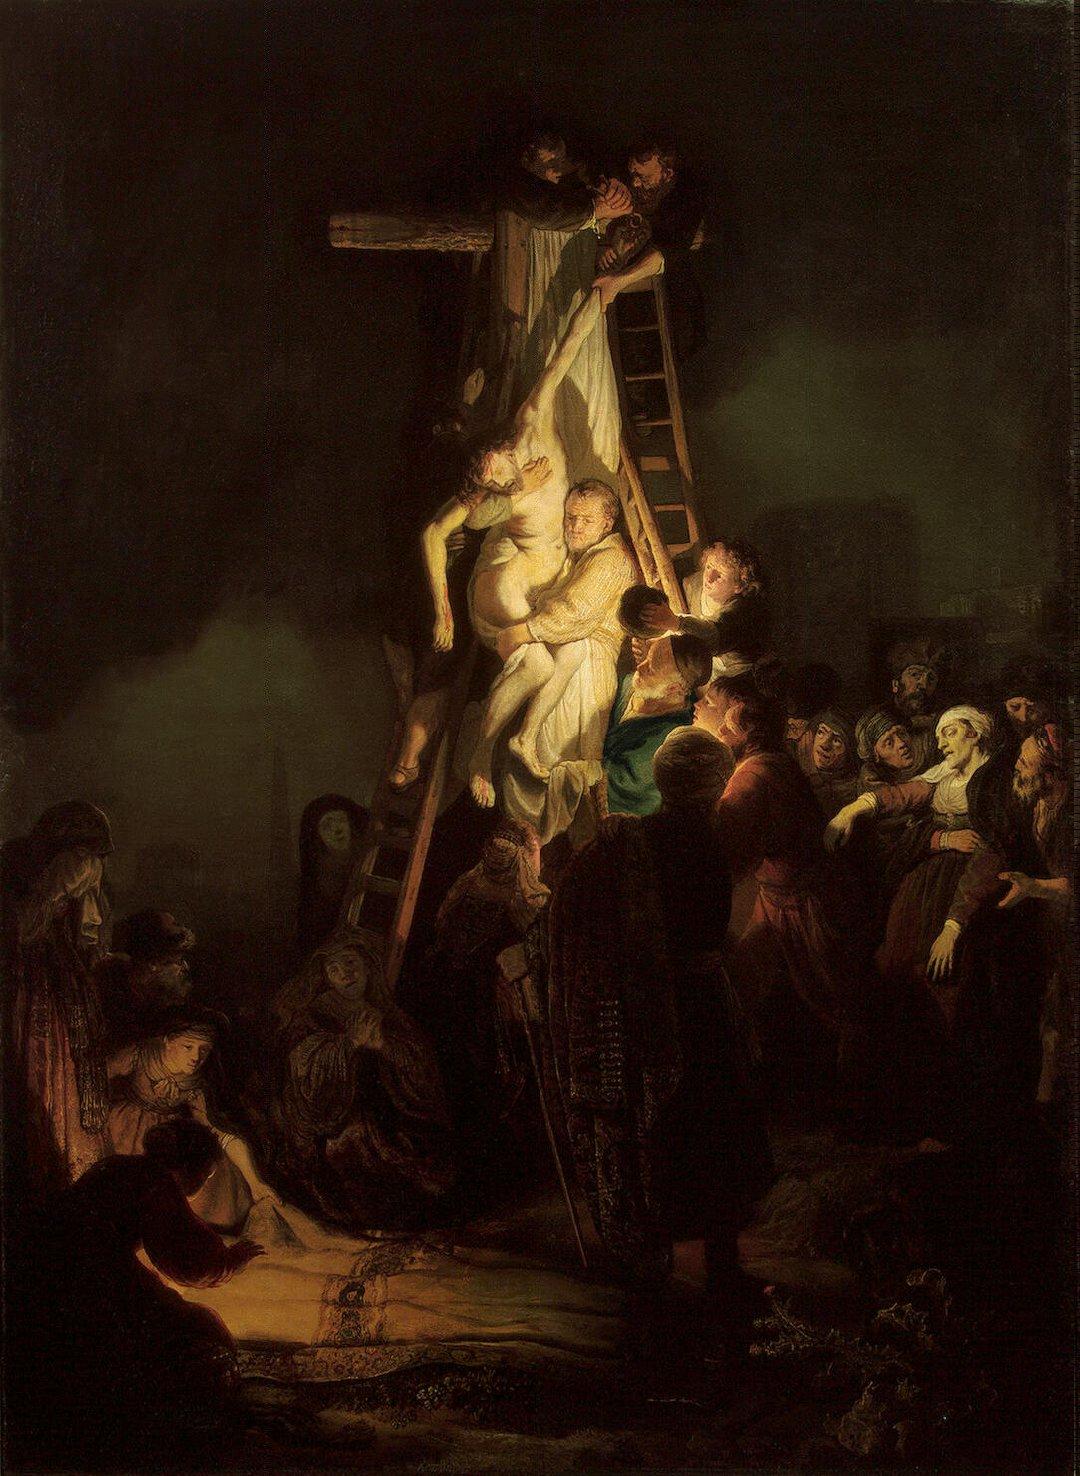 Rembrandt_Harmensz._van_Rijn-ZZZ-Descent_from_the_Cross